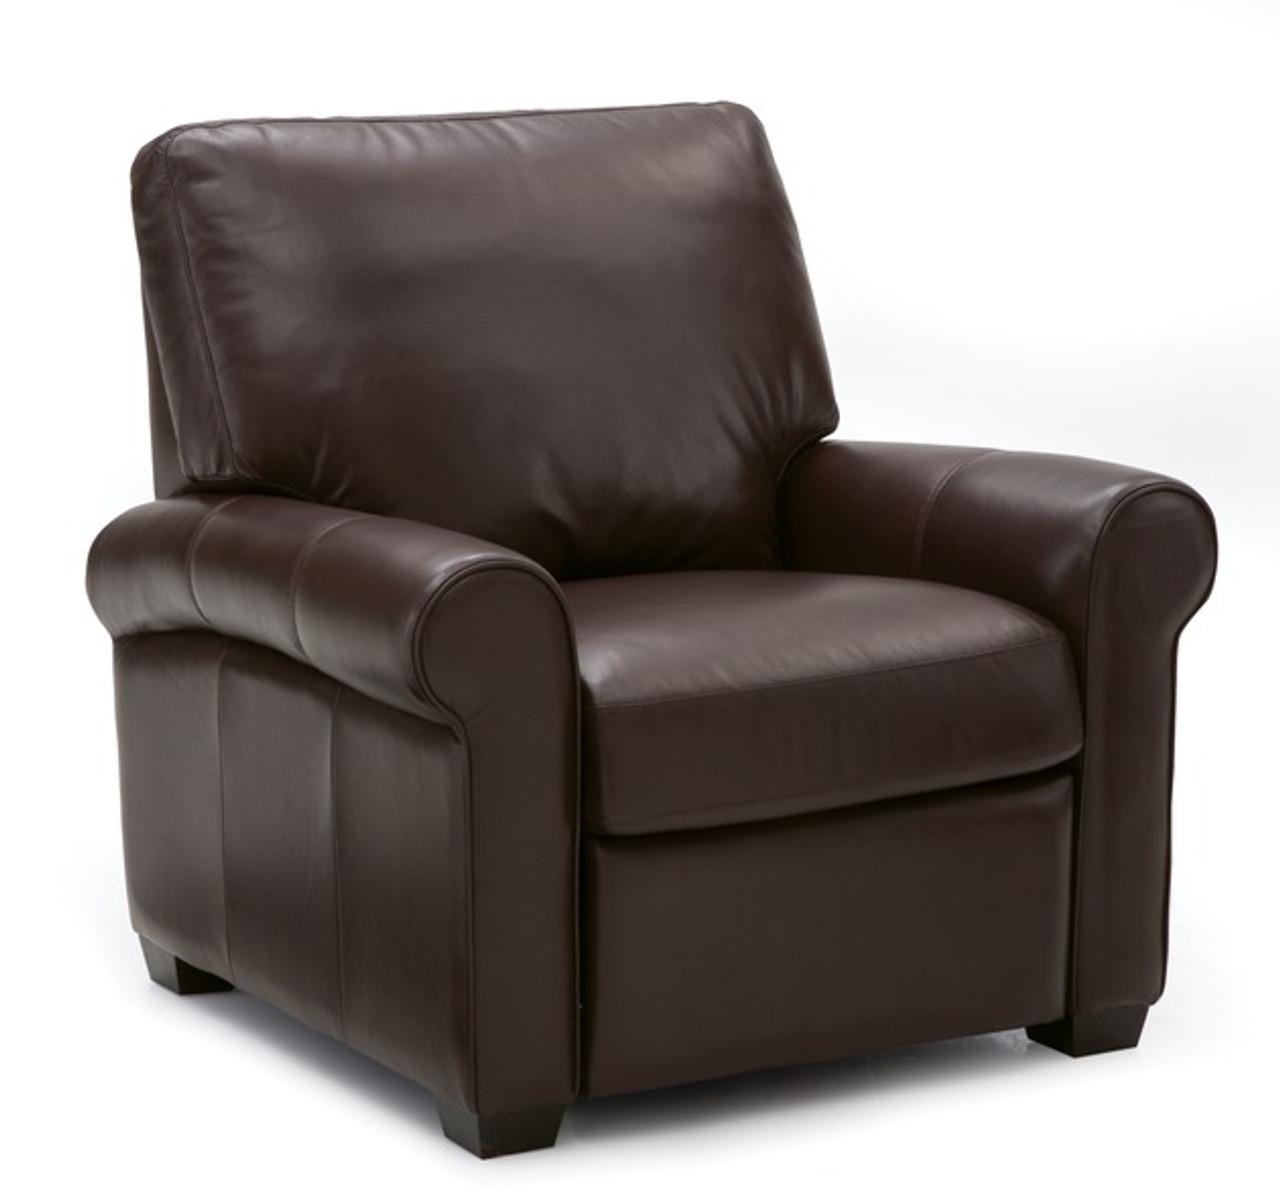 Magnum Chair Payton On Sale Near Houston Friendswood League City At Starfine Furniture Mattress